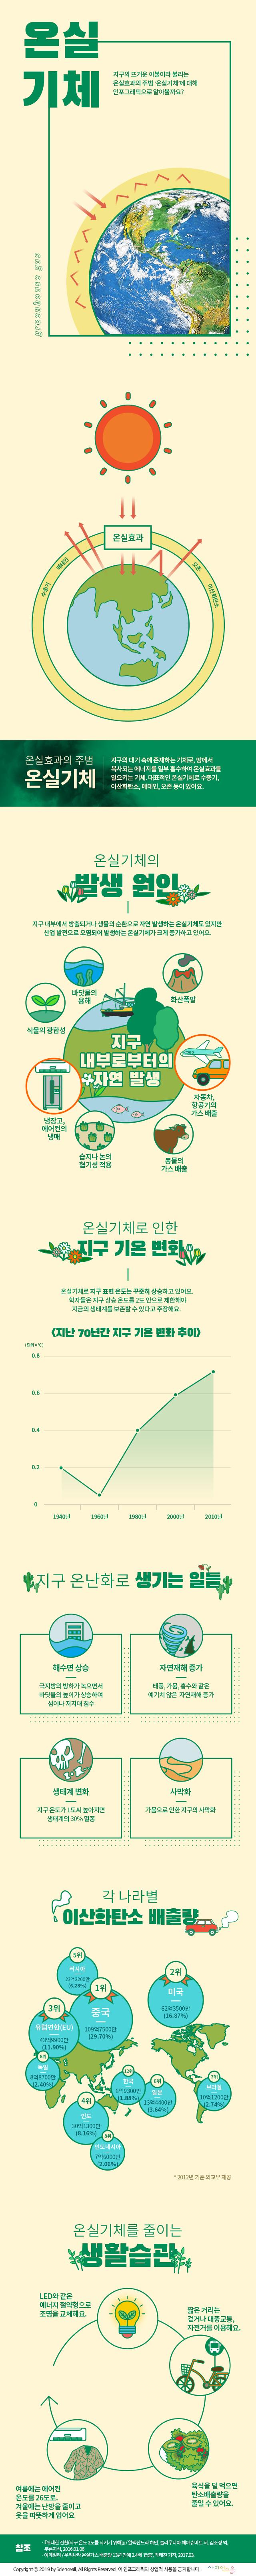 infographic_55호_온실기체-web(190722)